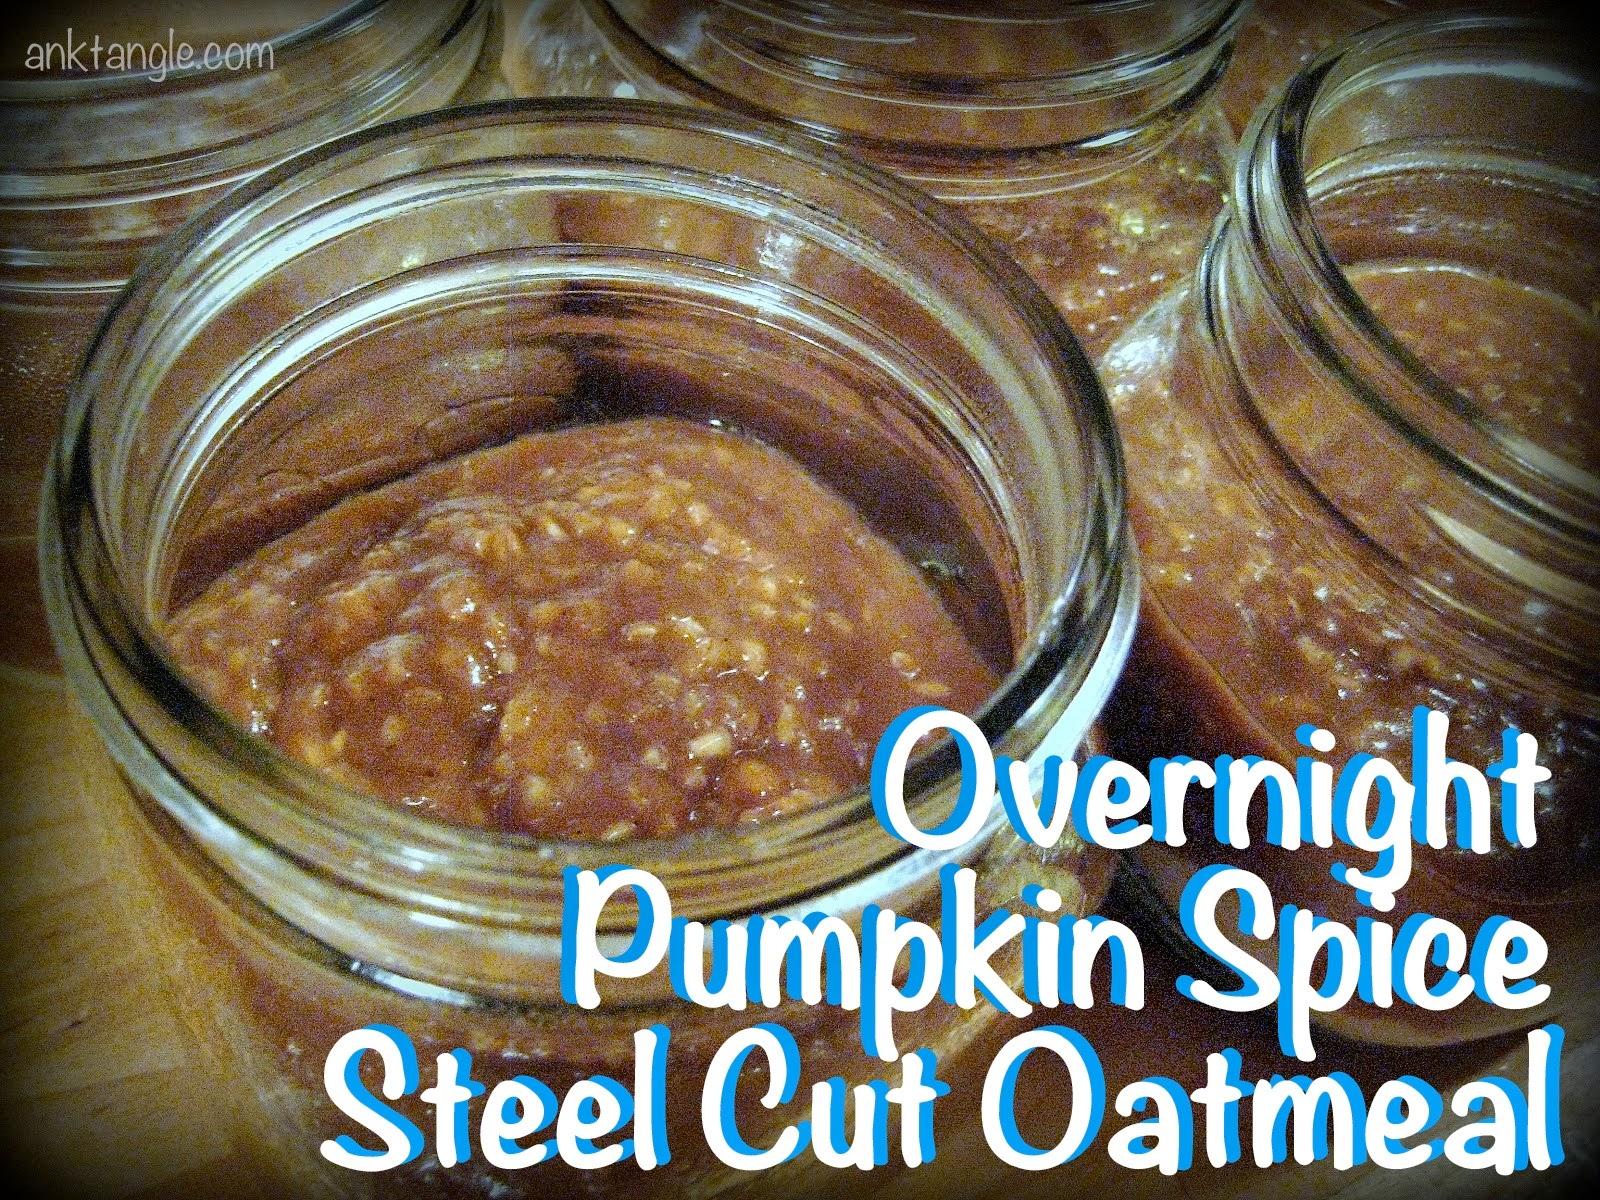 Anktangle: Overnight Pumpkin Spice Steel Cut Oatmeal Recipe